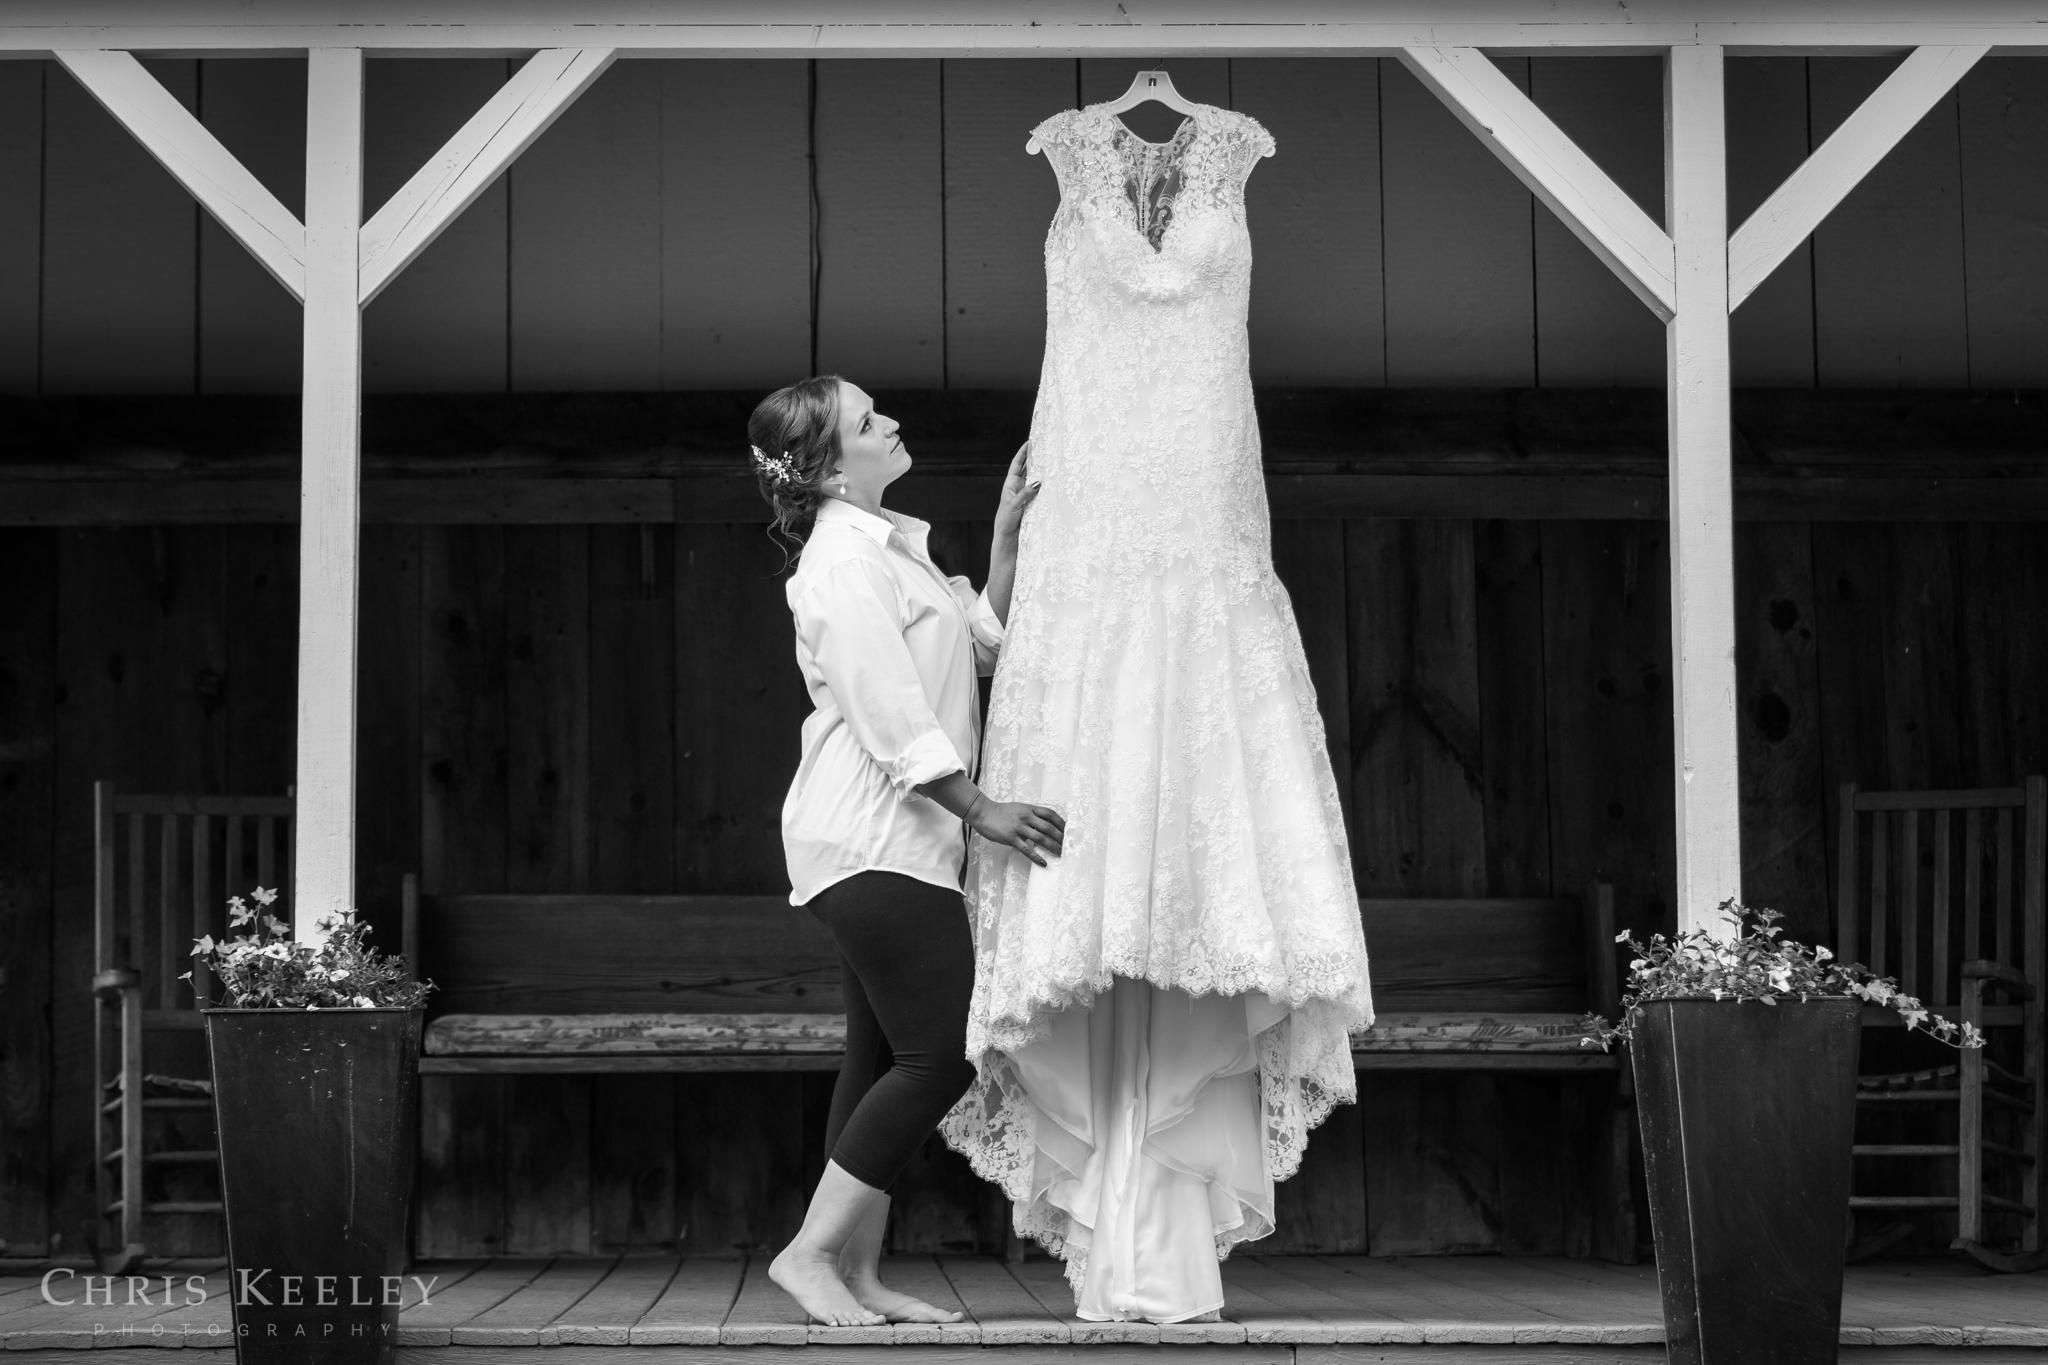 chris-keeley-photography-new-hampshire-wedding-photographer-04.jpg